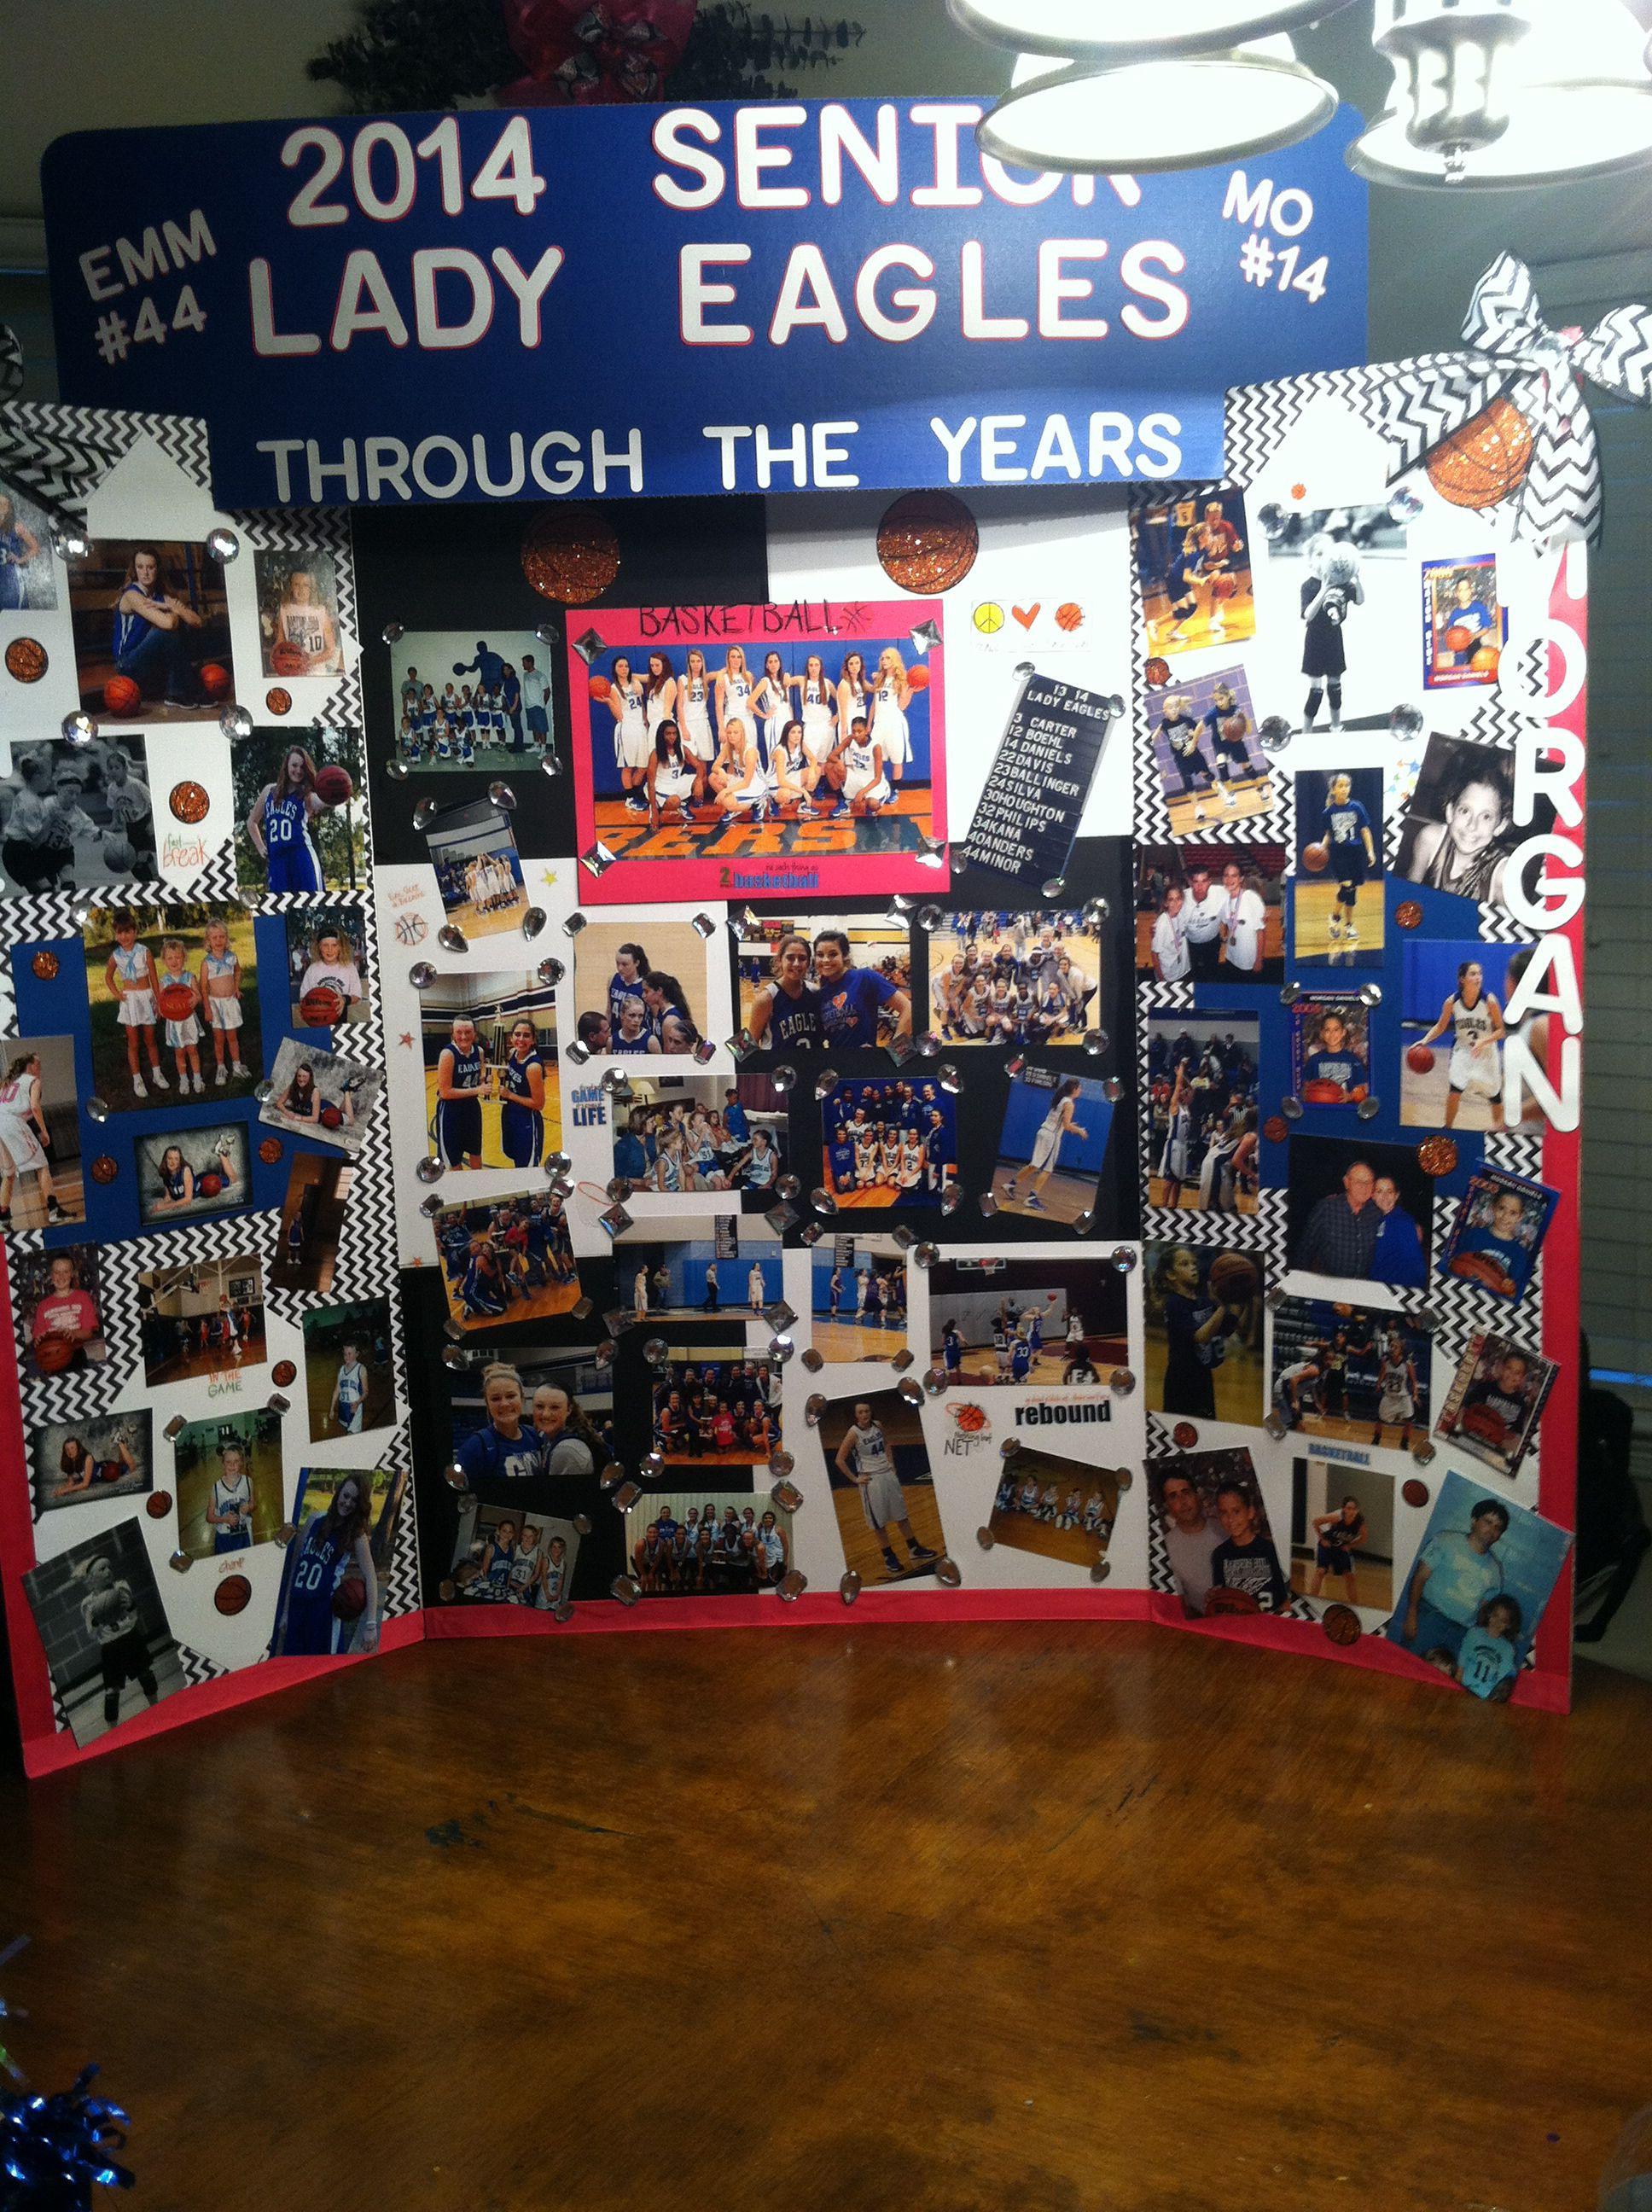 Pin By Carolyn Minor On Graduation Ideas Senior Night Gifts Senior Night Basketball Senior Night